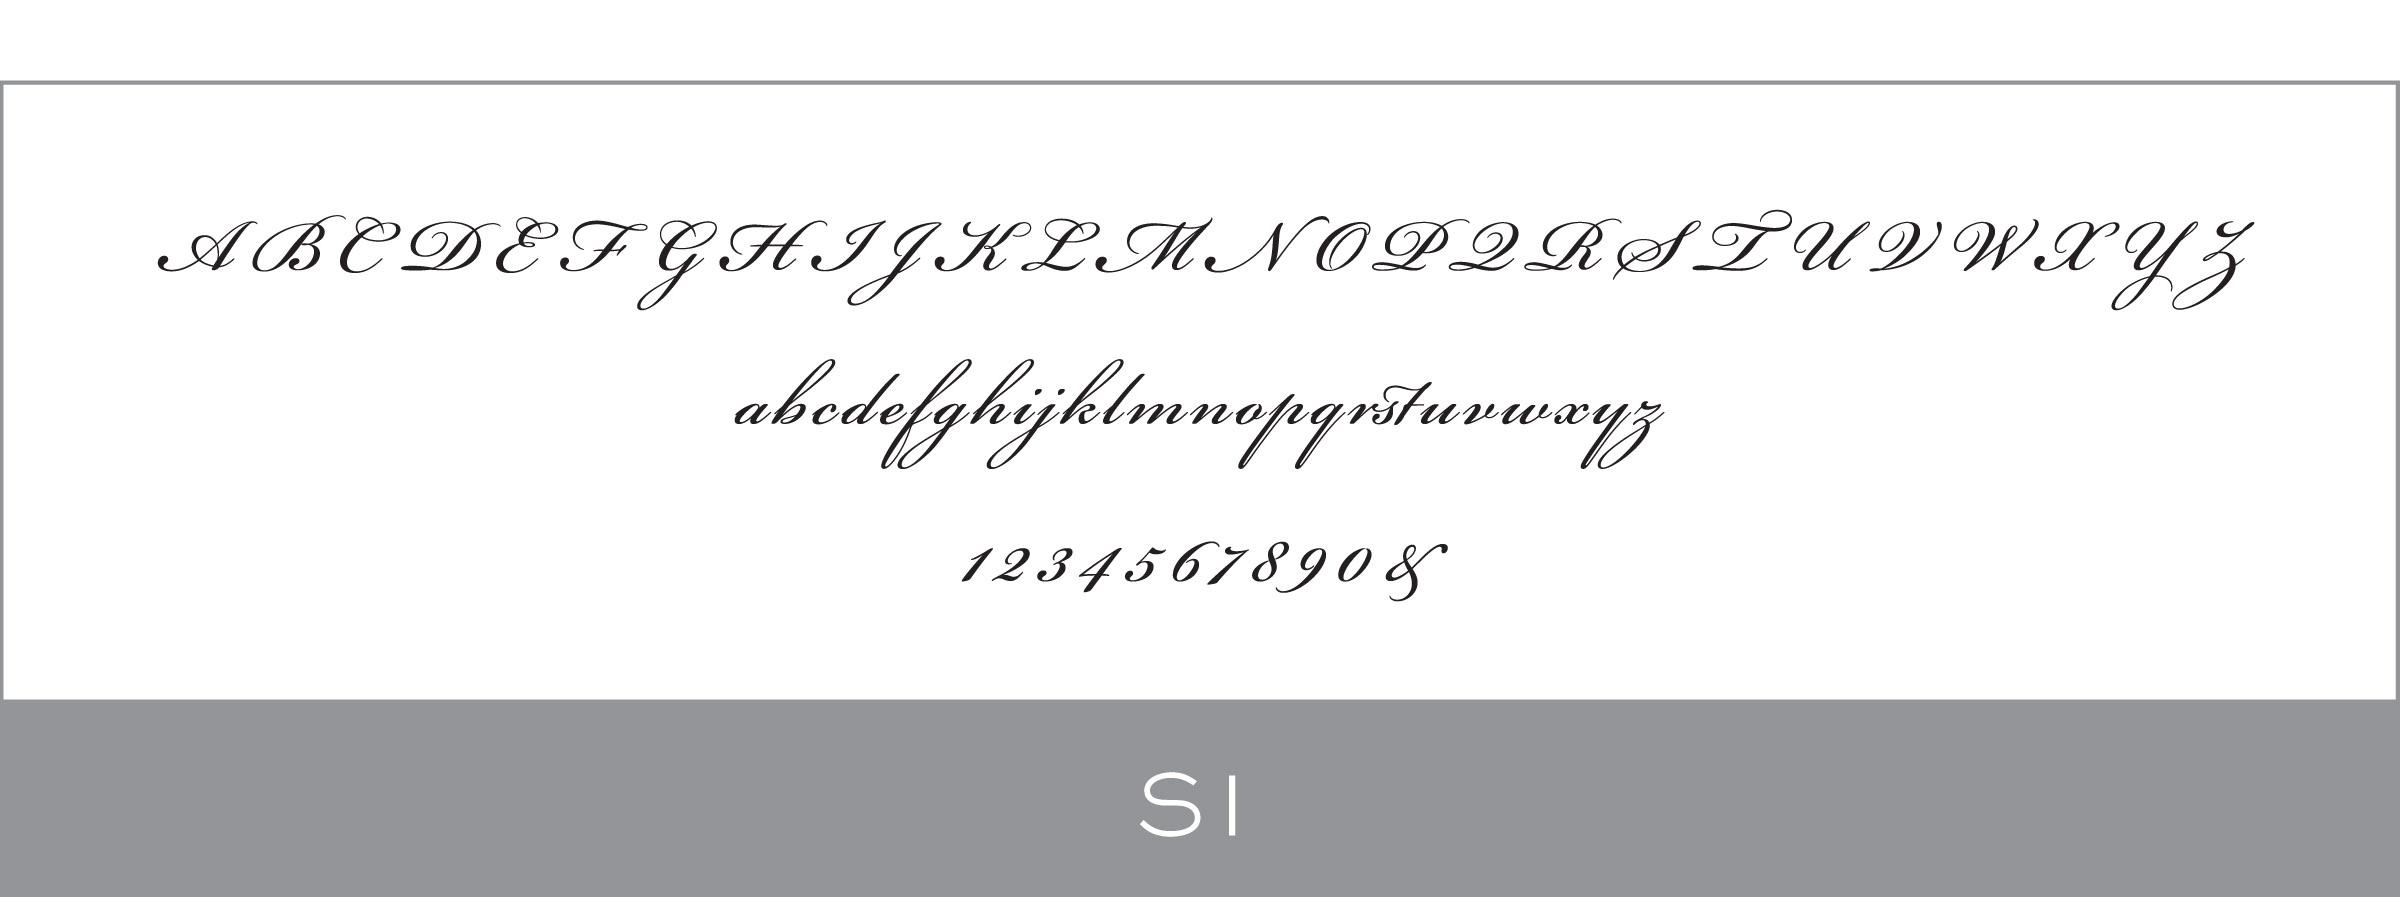 S1_Haute_Papier_Font.jpg